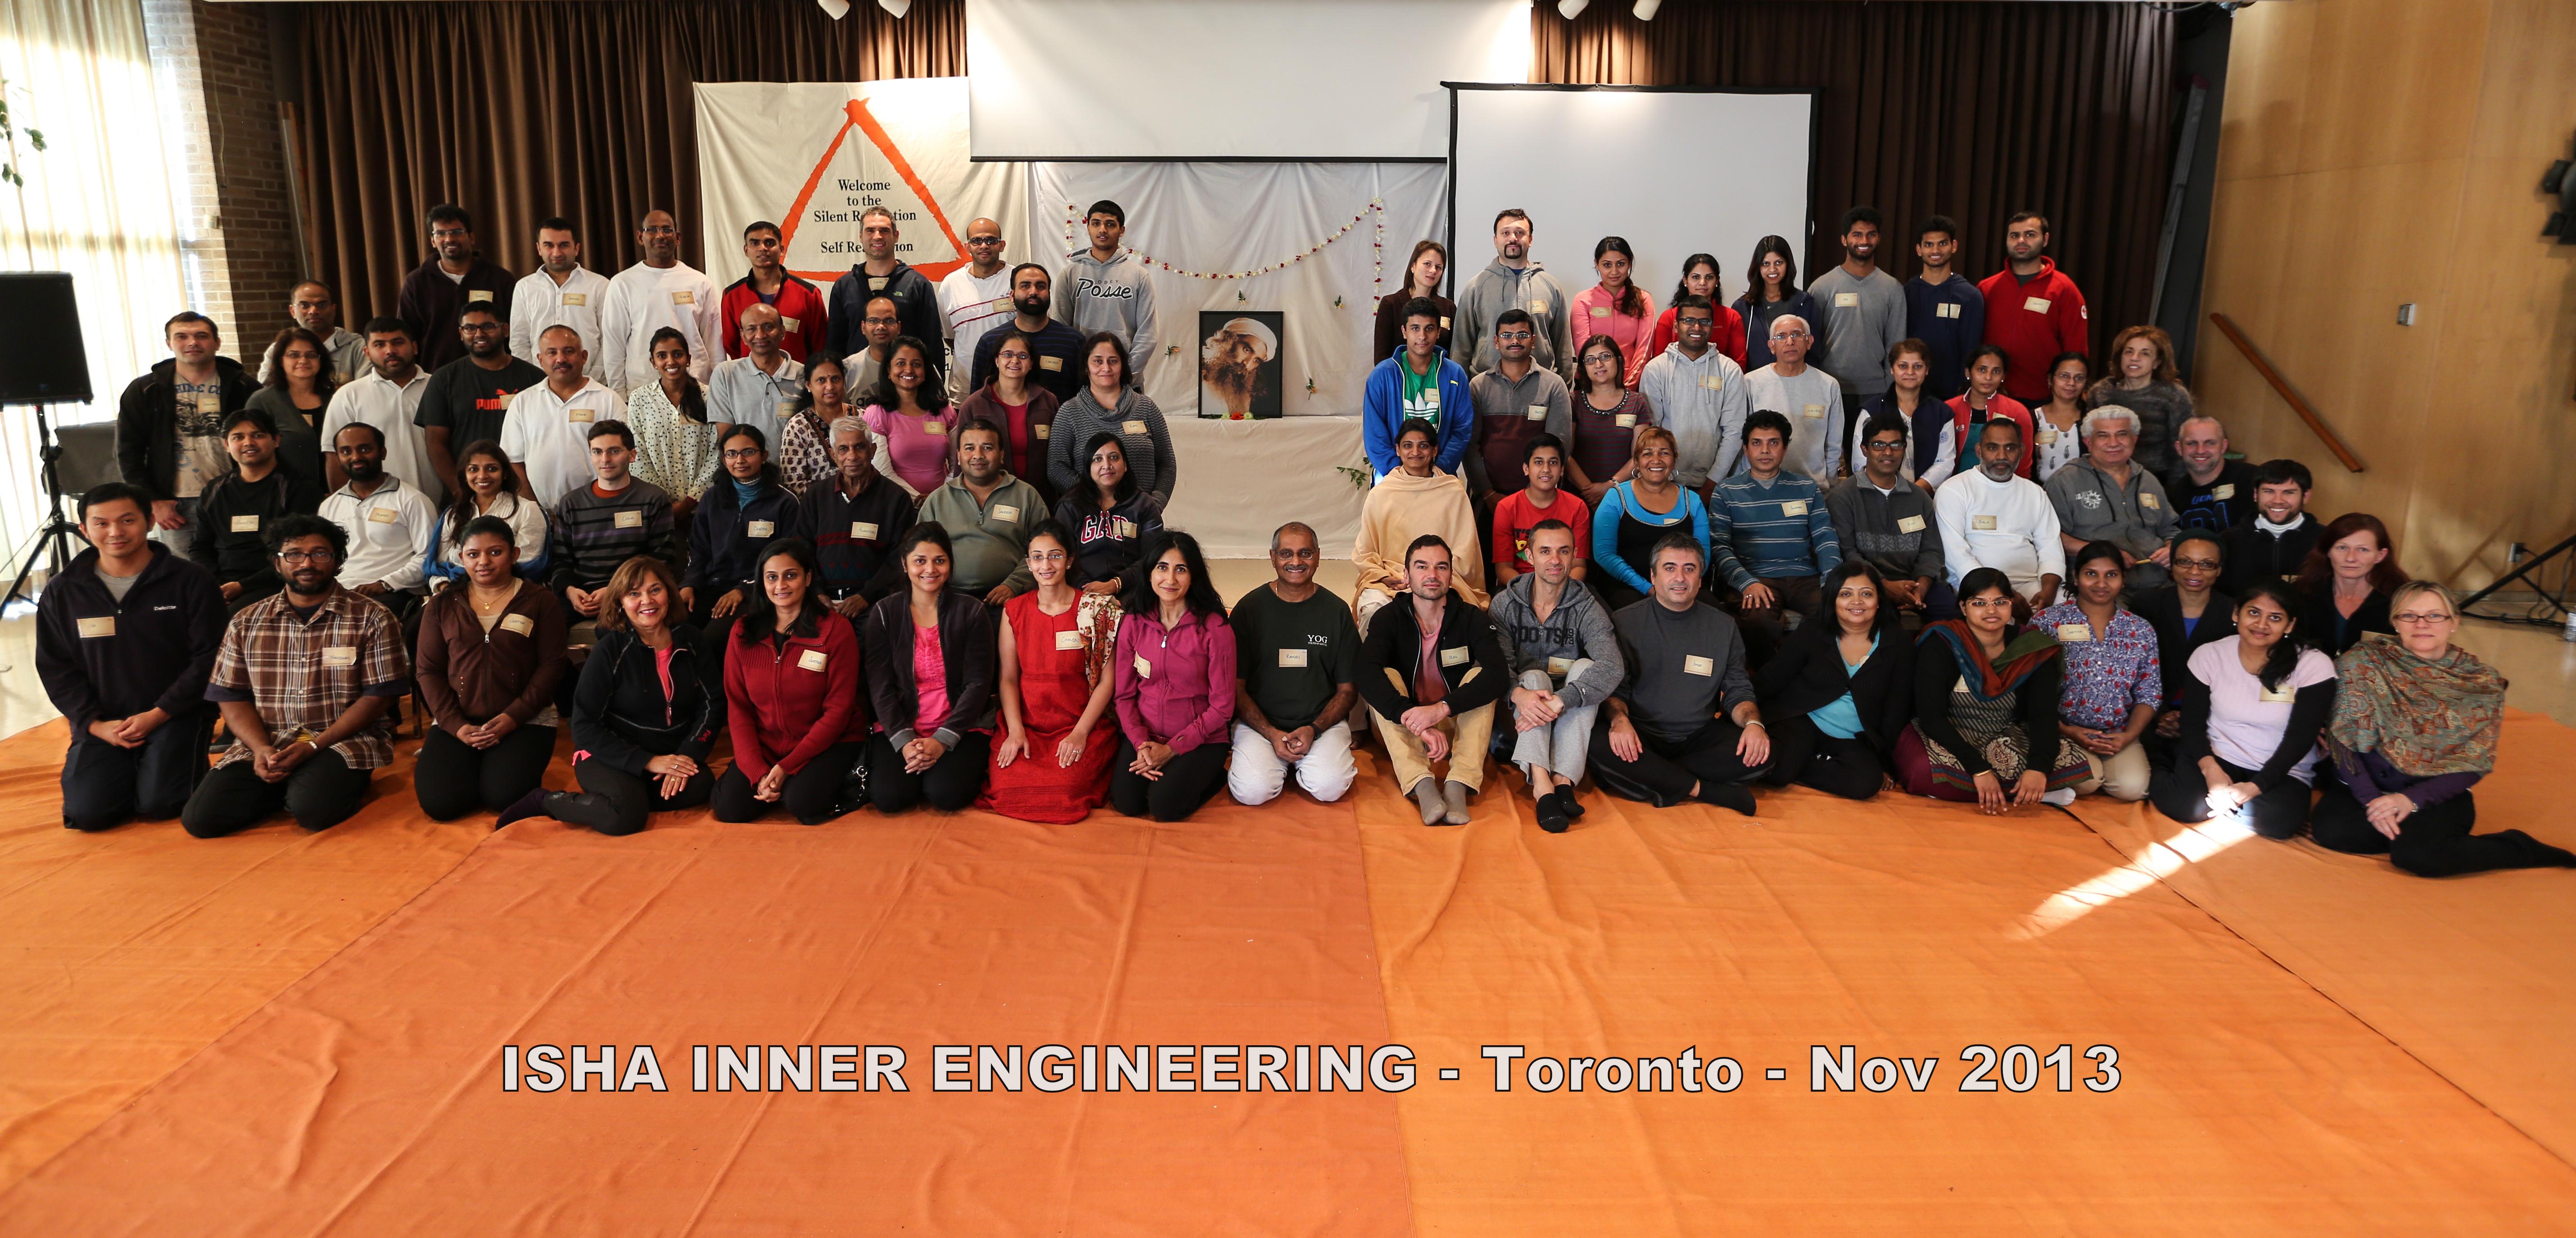 Toronto December 2013  Isha Usa Newsletters with regard to Isha Lunar Calendar Usa